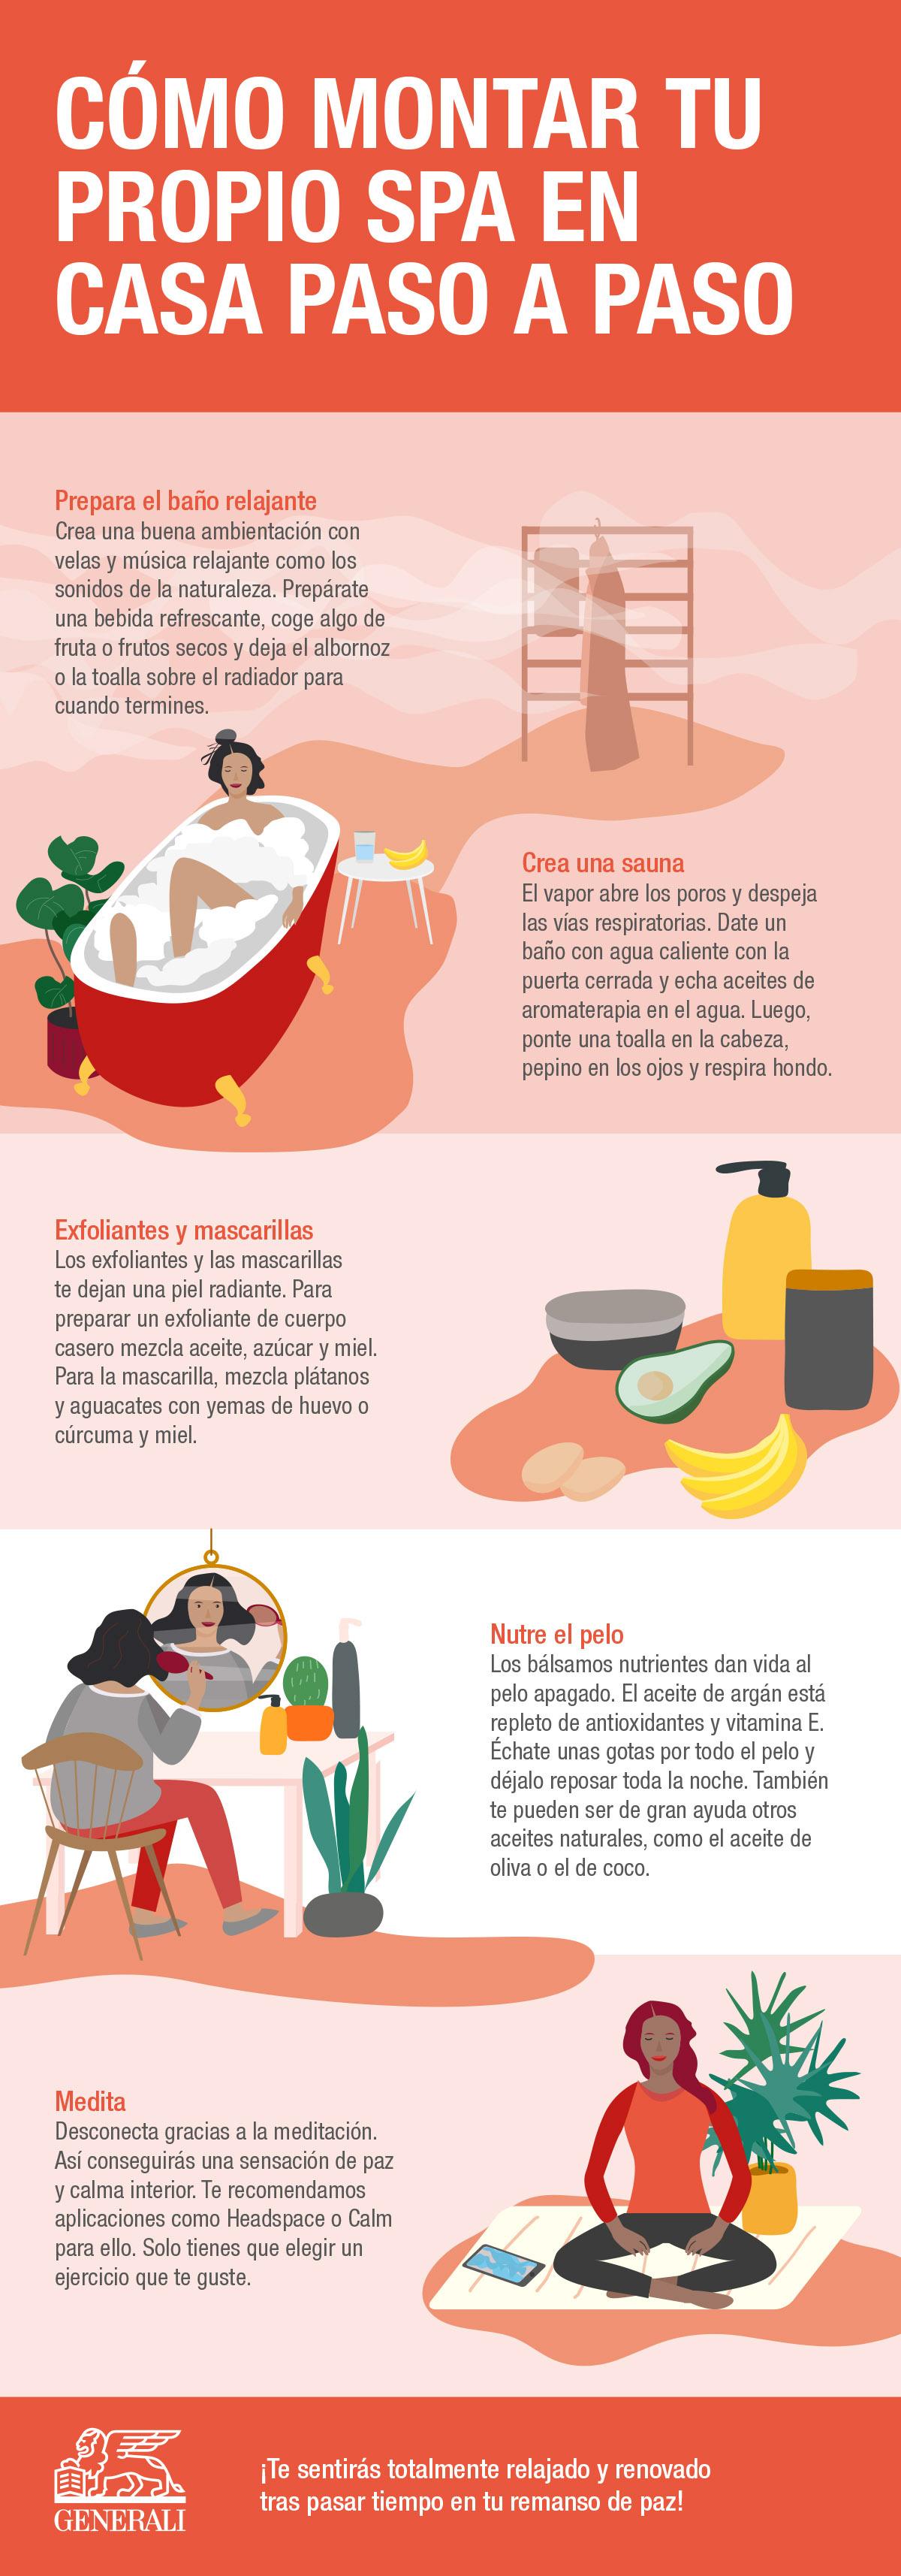 DIY_Spa_Day_Infographic_SPANISH.jpg